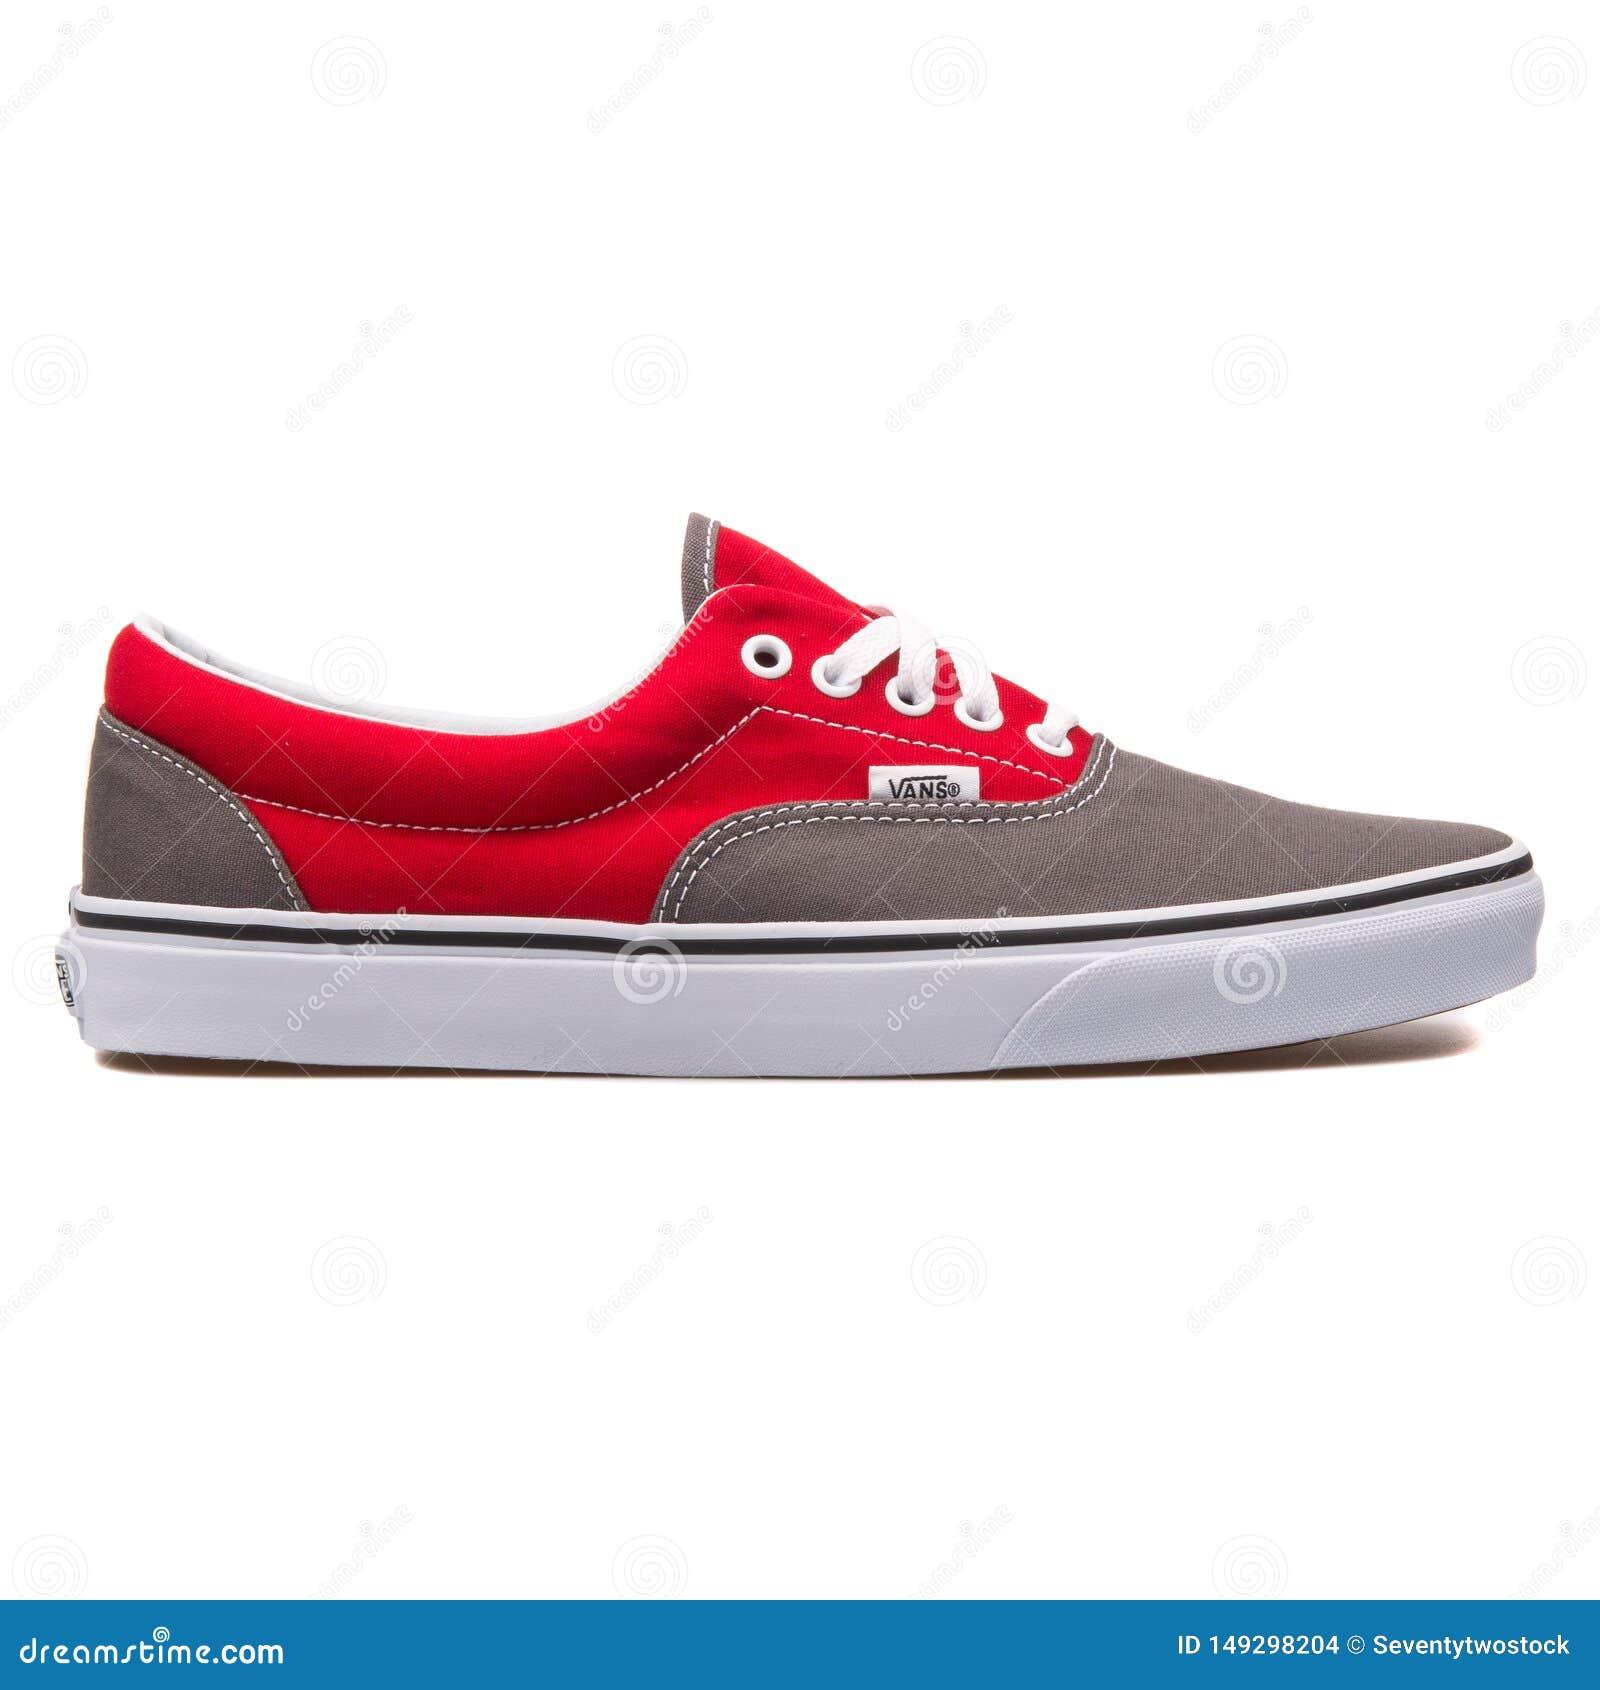 Vans Era Red And Grey Sneaker Editorial